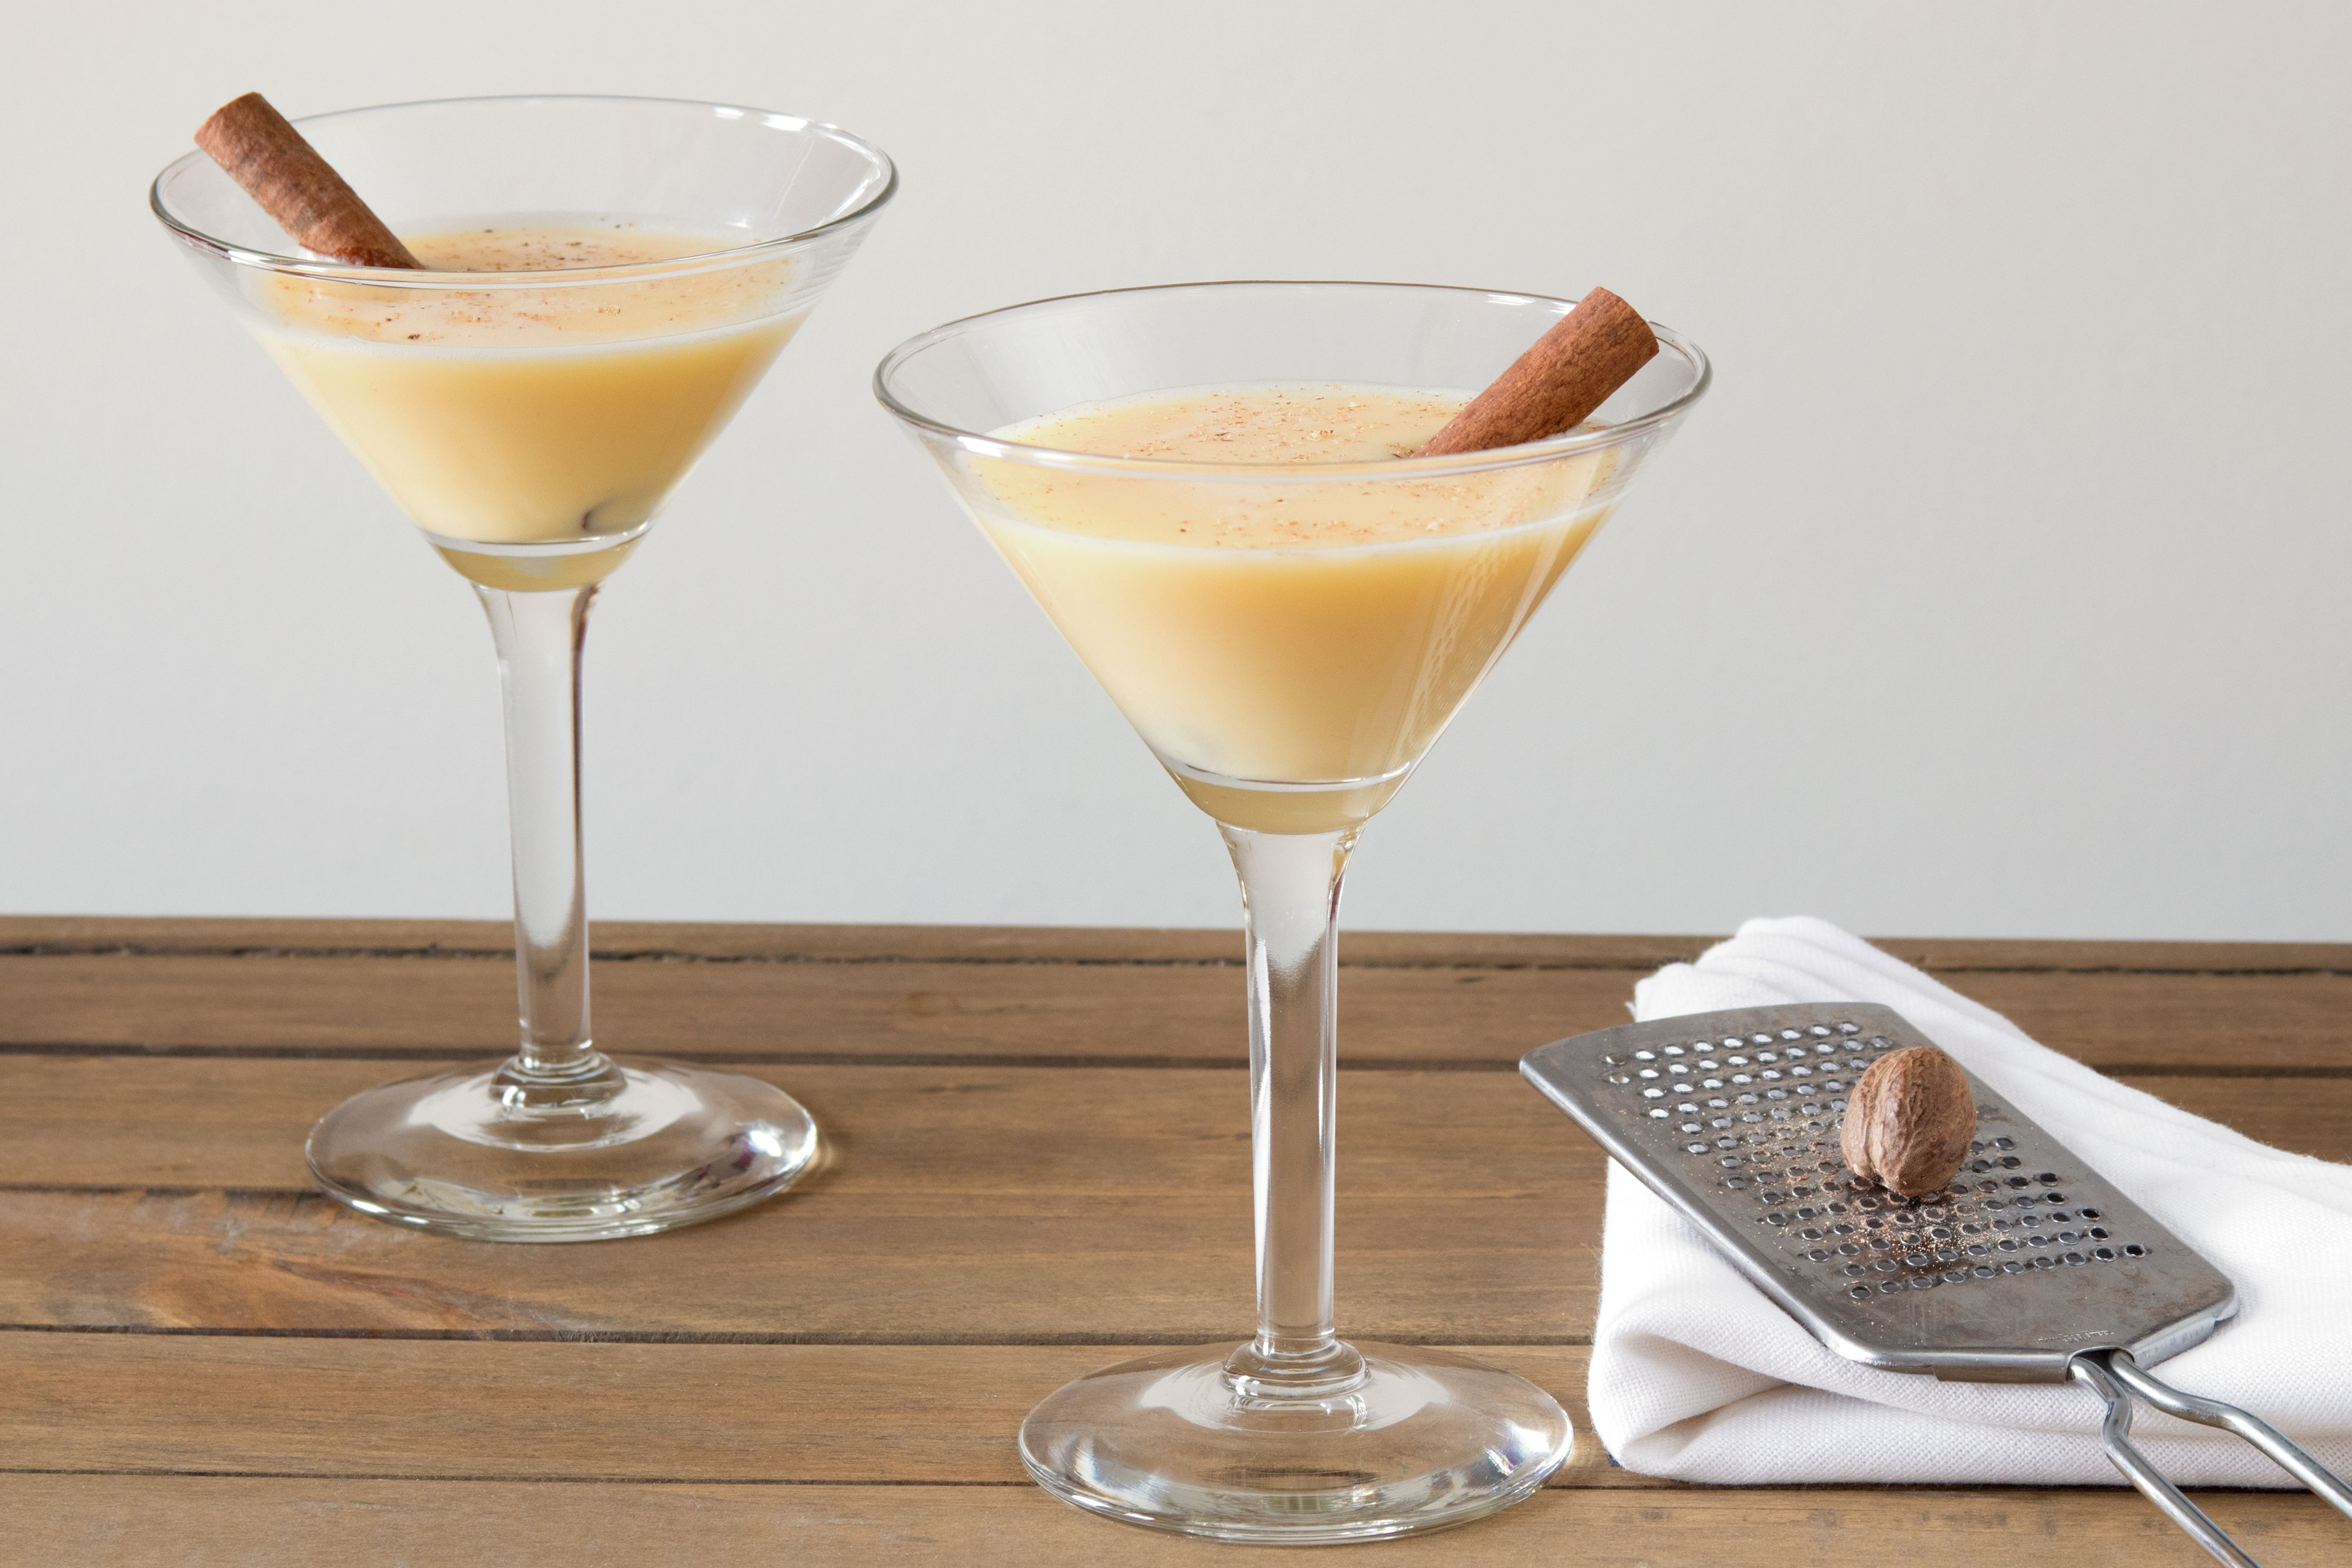 Make Your Holidays Brighter With a Creamy Eggnog Martini